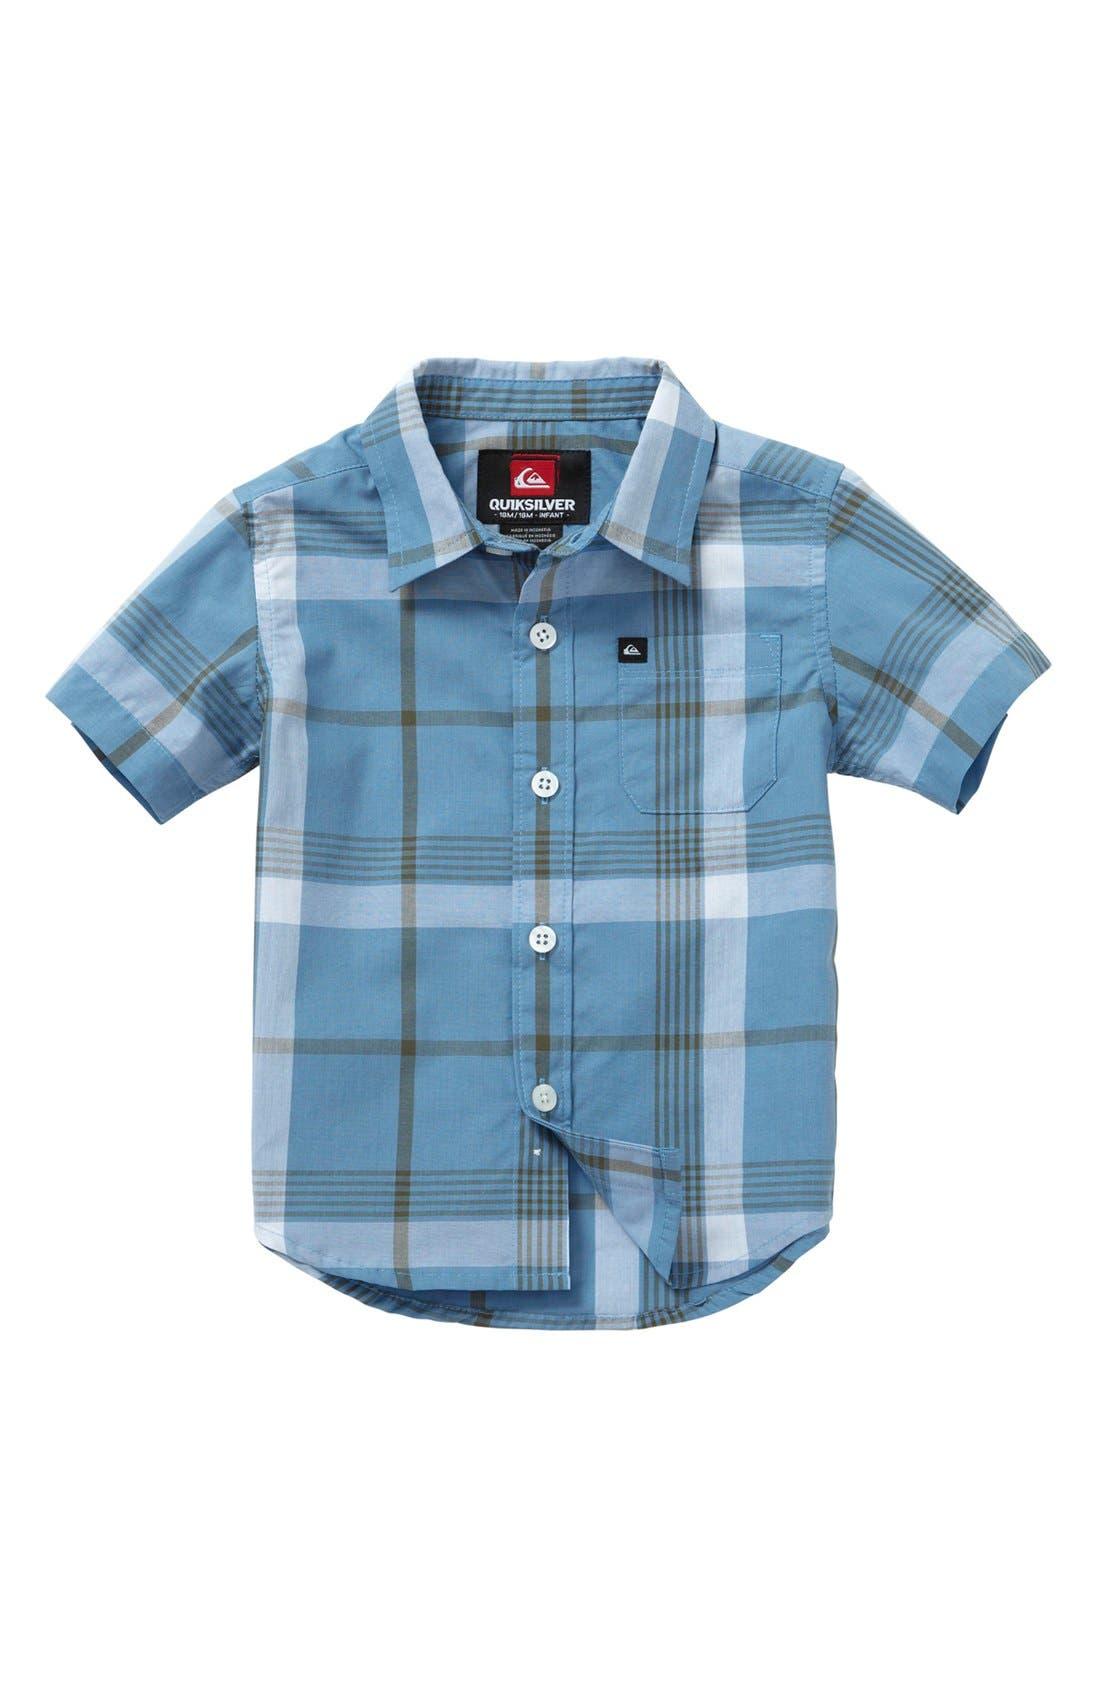 Alternate Image 1 Selected - Quiksilver 'Jumbo Gumbo' Plaid Shirt (Baby Boys)